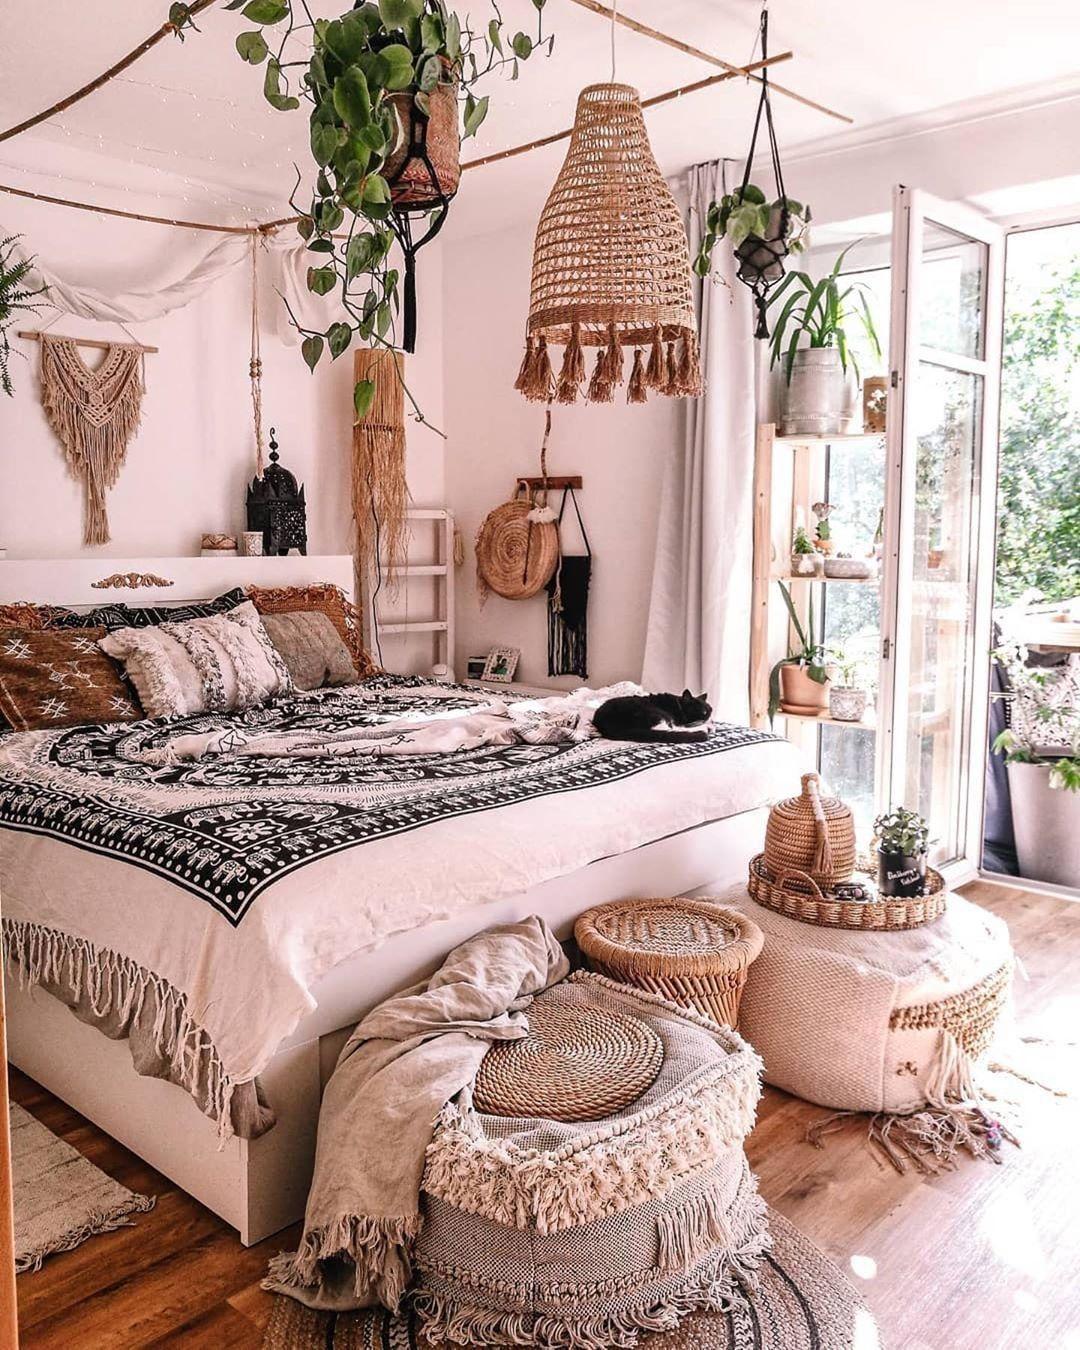 Modern Bohemian Bedroom Decor Ideas Bedroom Design Bedroom Inspirations Bedroom Decor